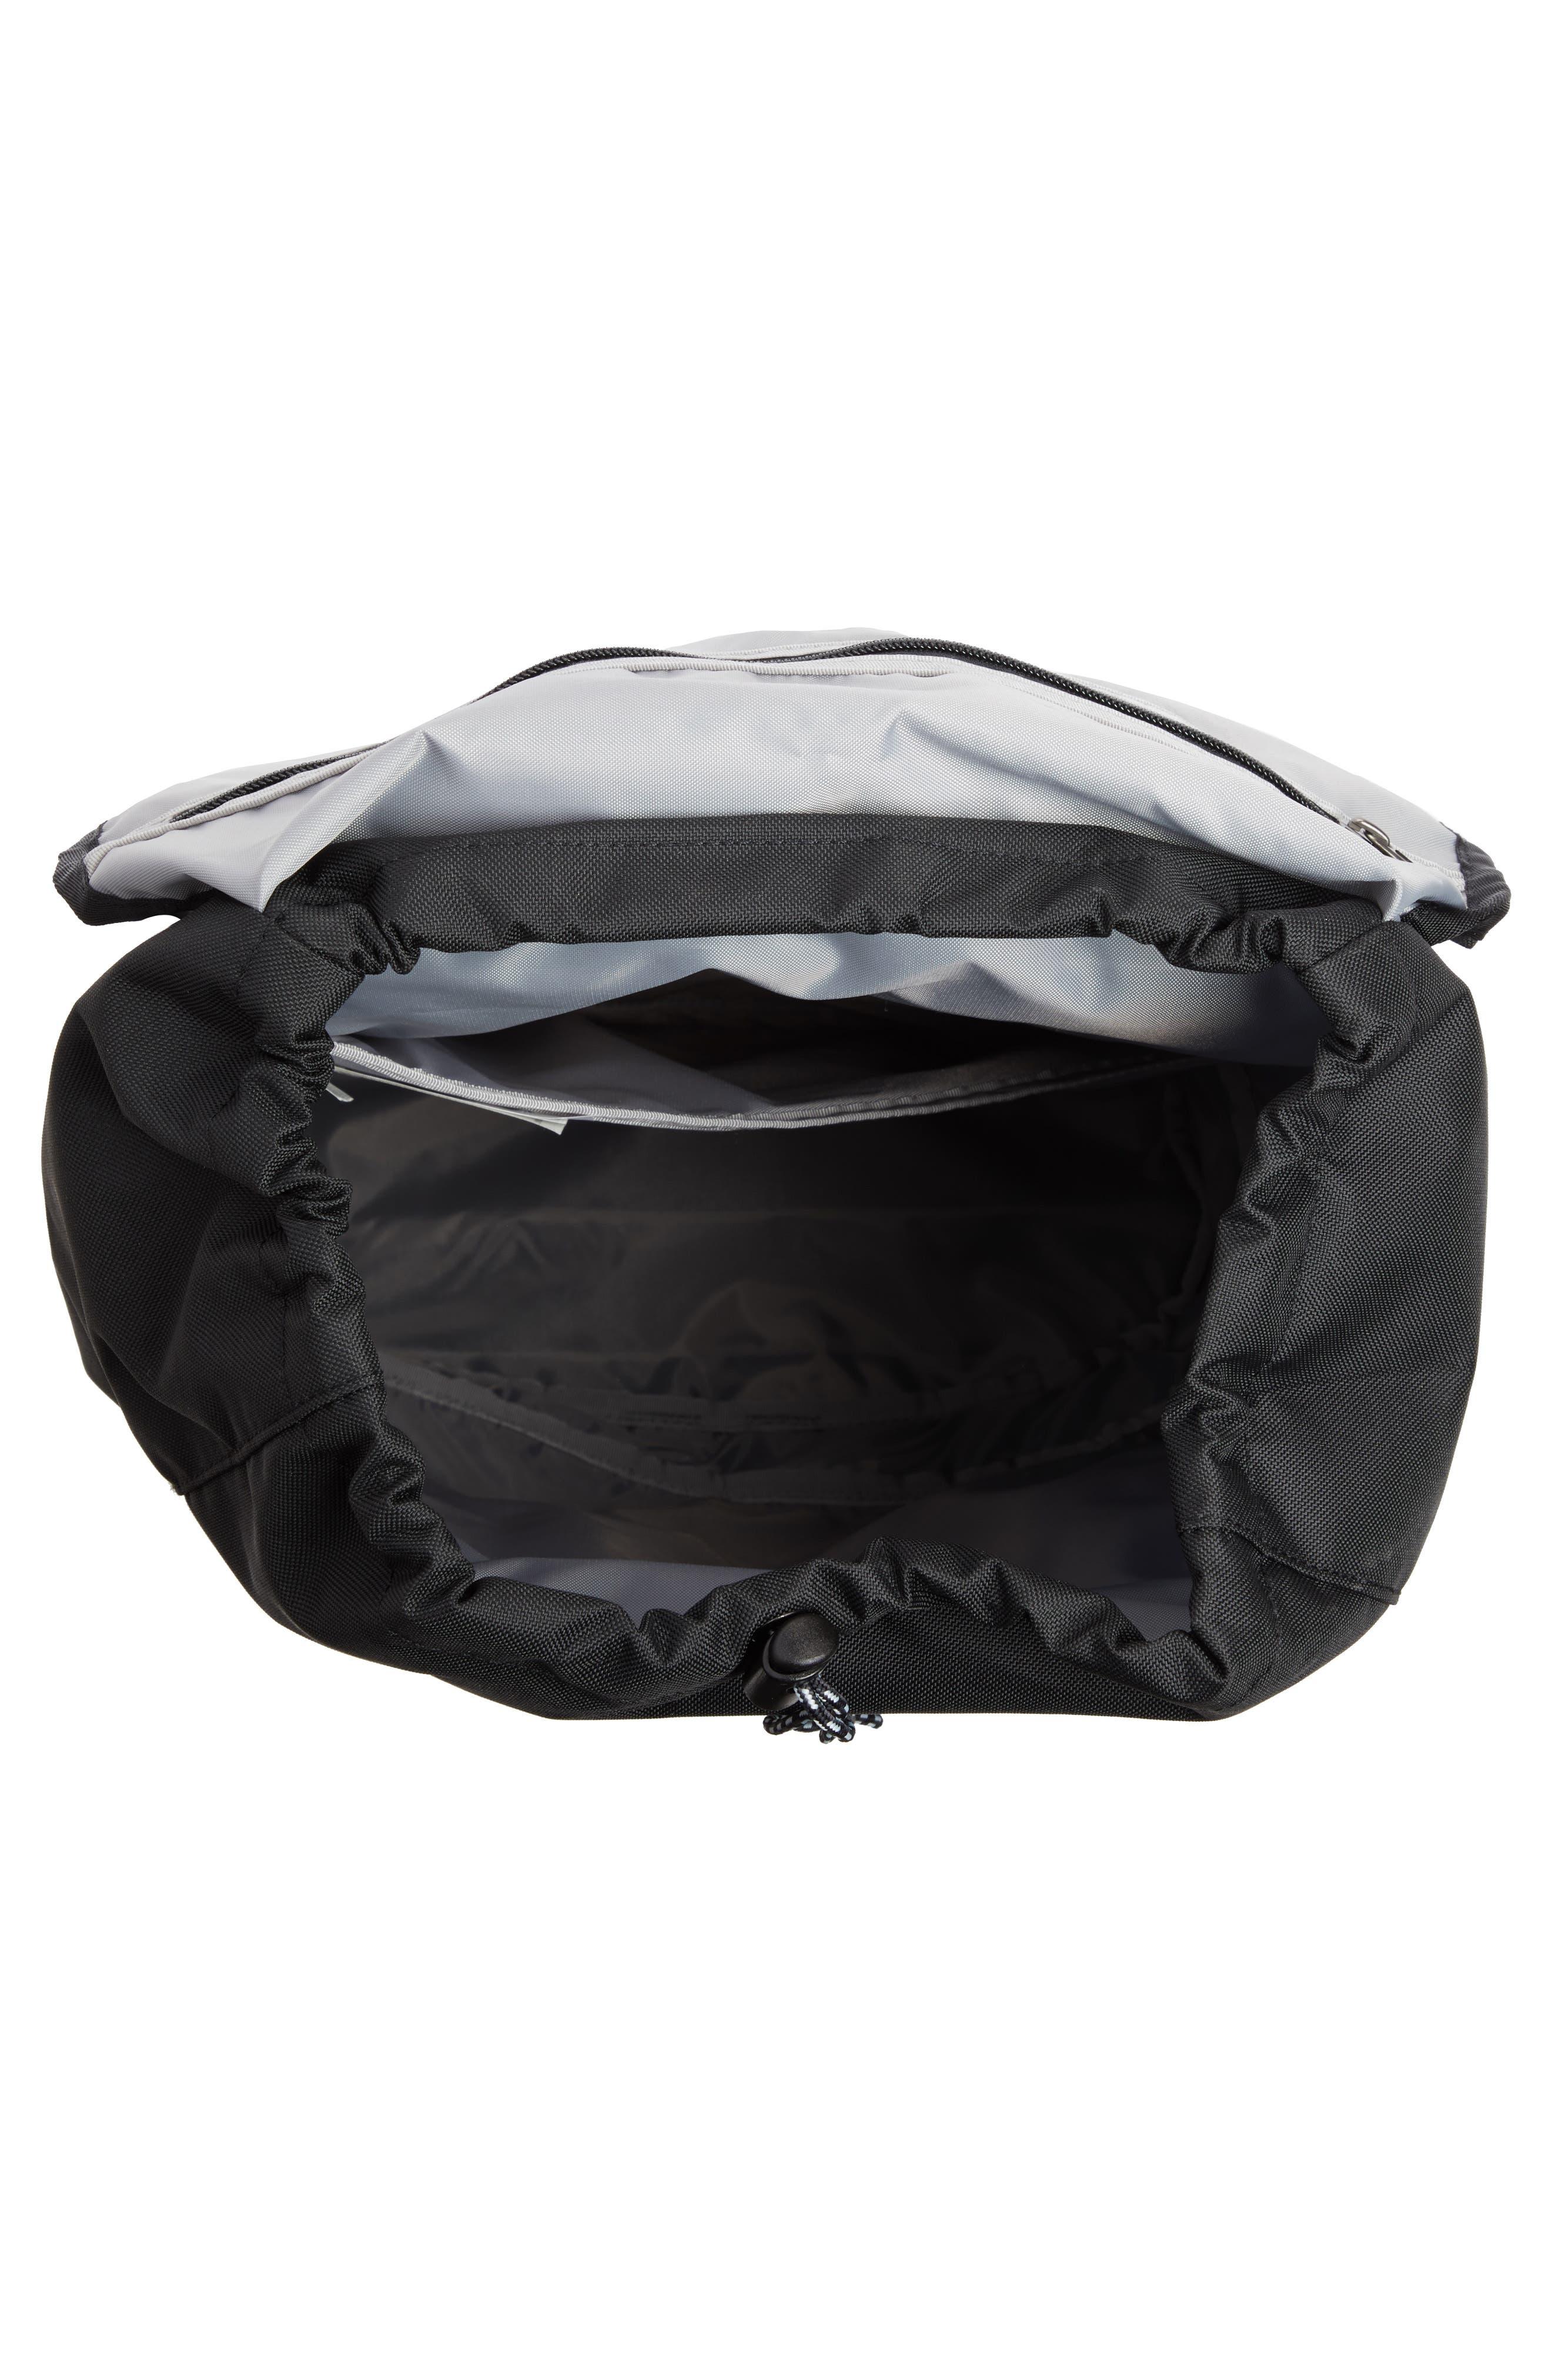 PATAGONIA,                             Arbor 25-Liter Backpack,                             Alternate thumbnail 4, color,                             001